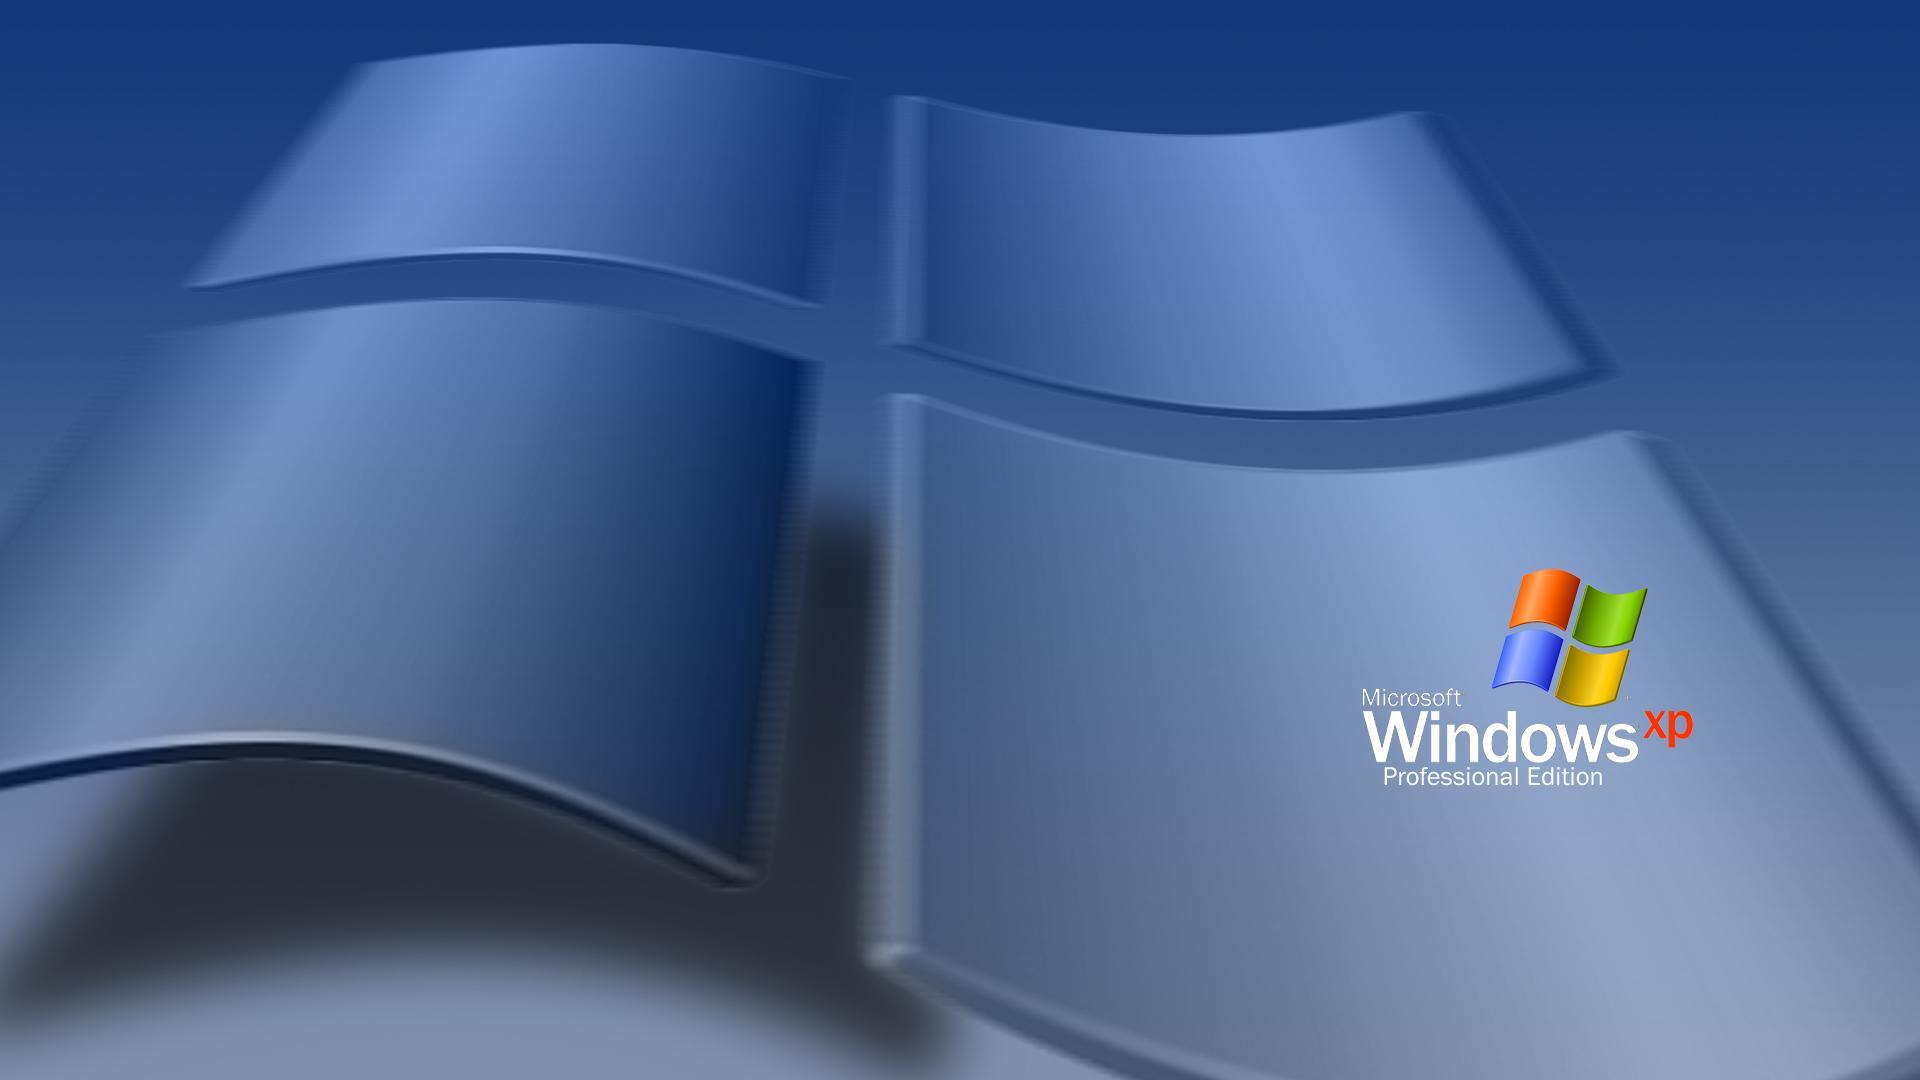 Microsoft windows xp professional free trial download